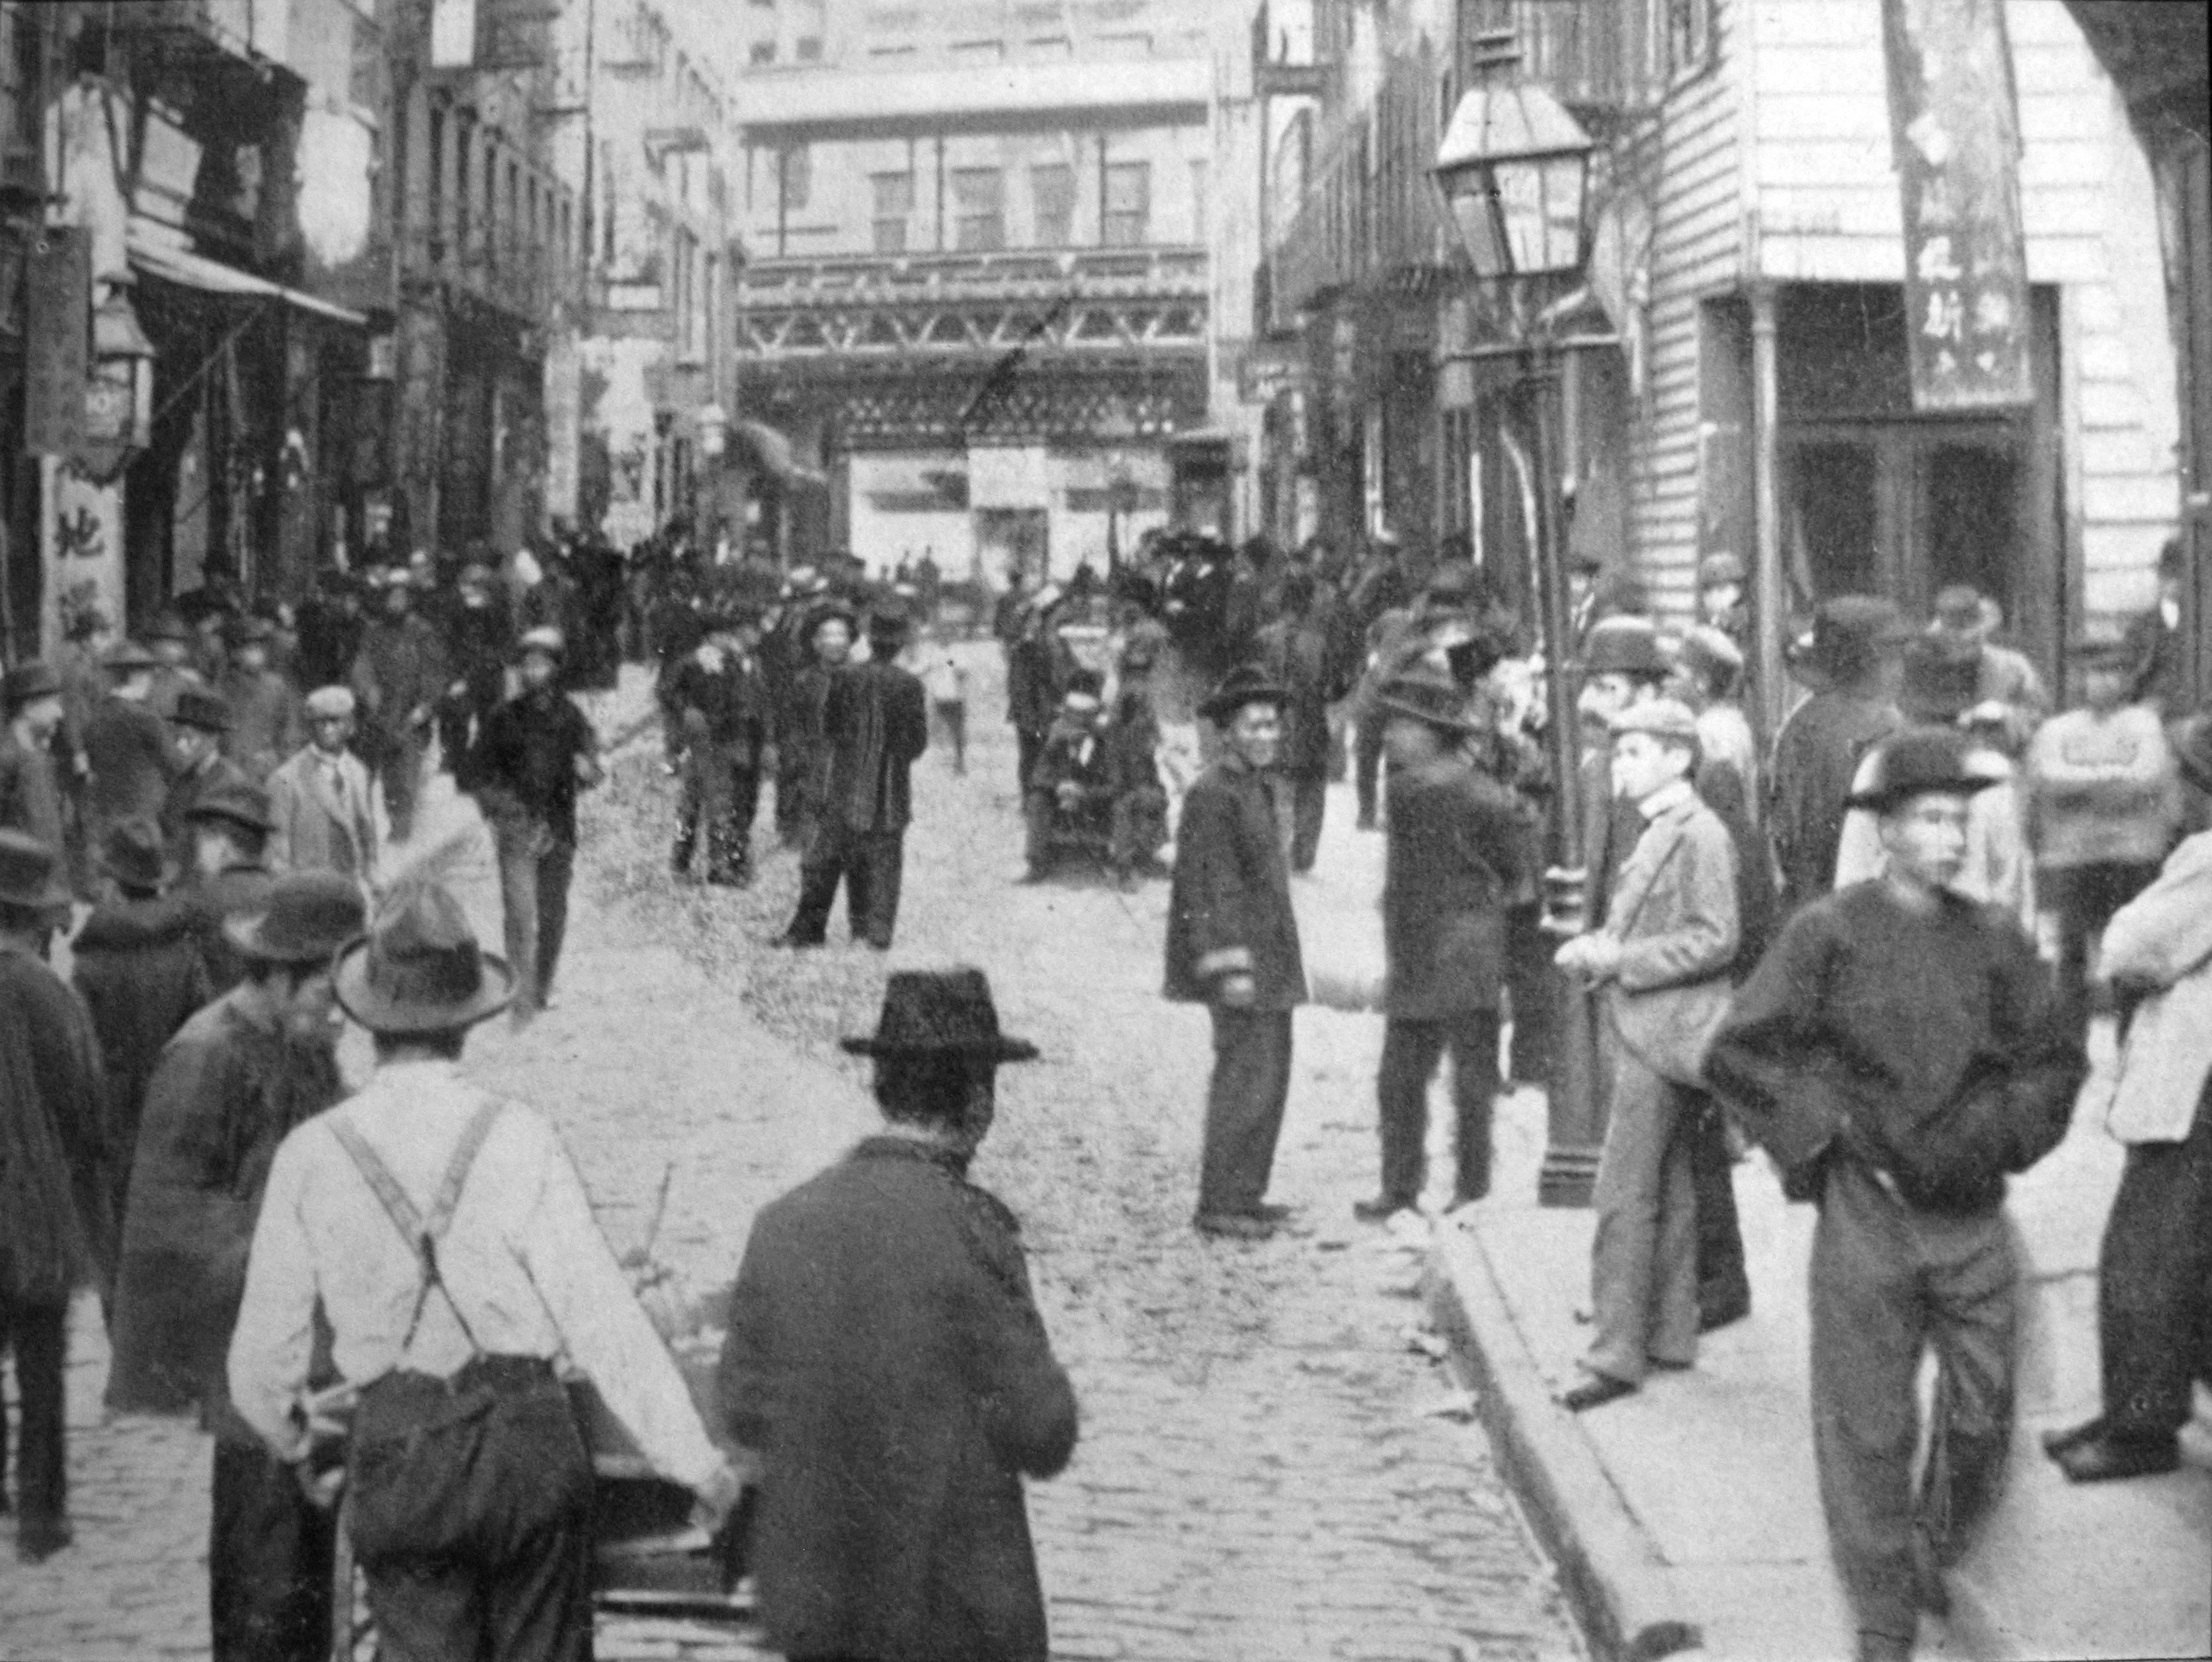 File:1899 Chinatown on Sunday - Poll street, New York, NY anagoria.